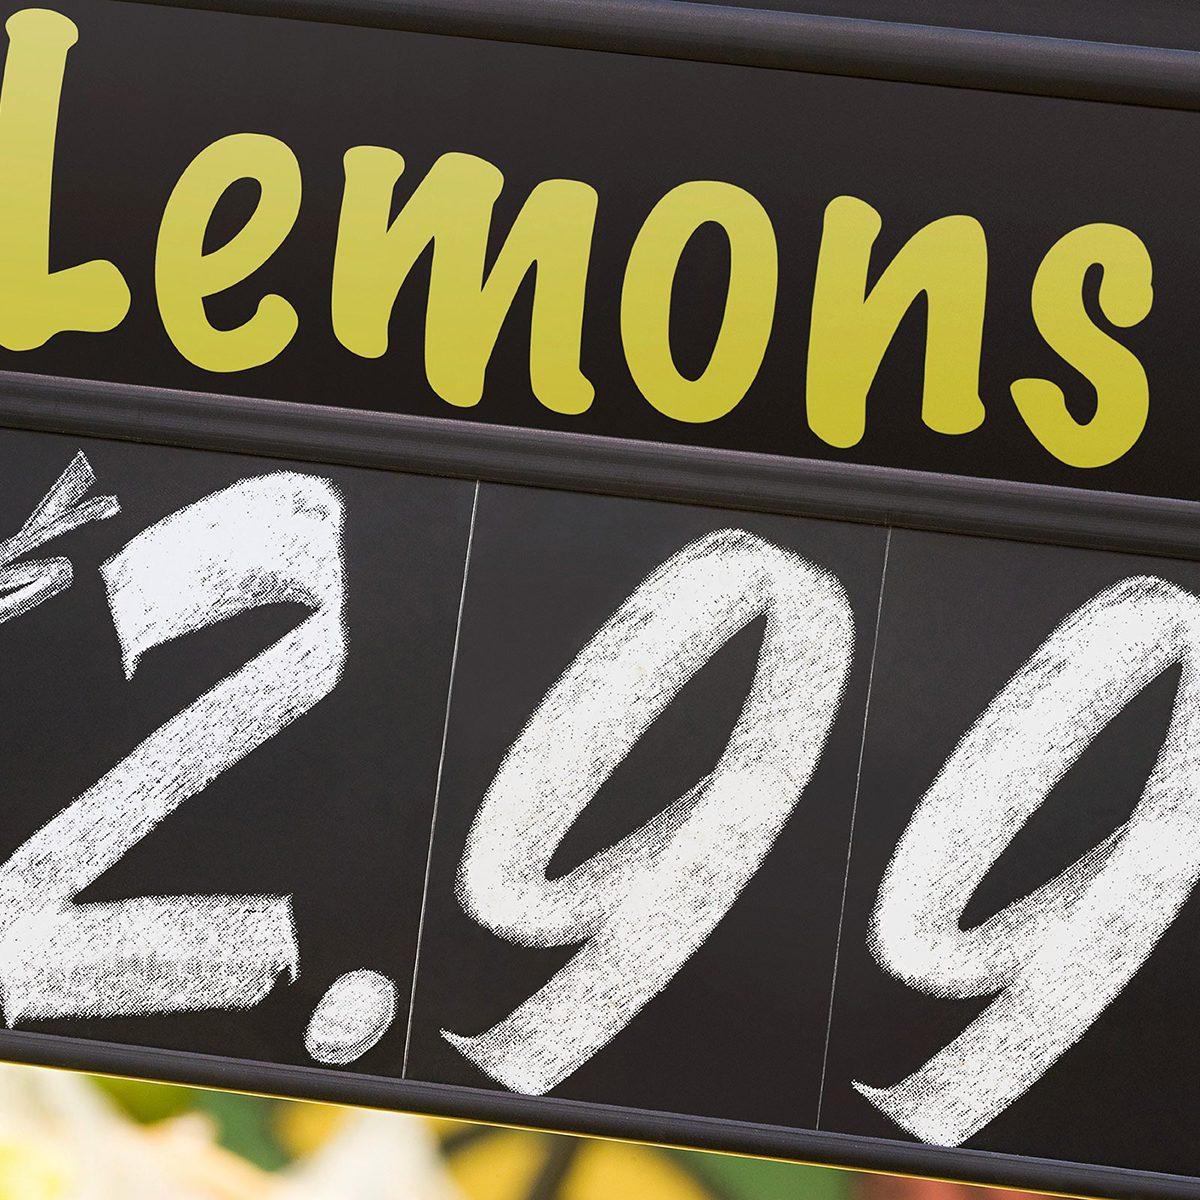 Lemon price sign